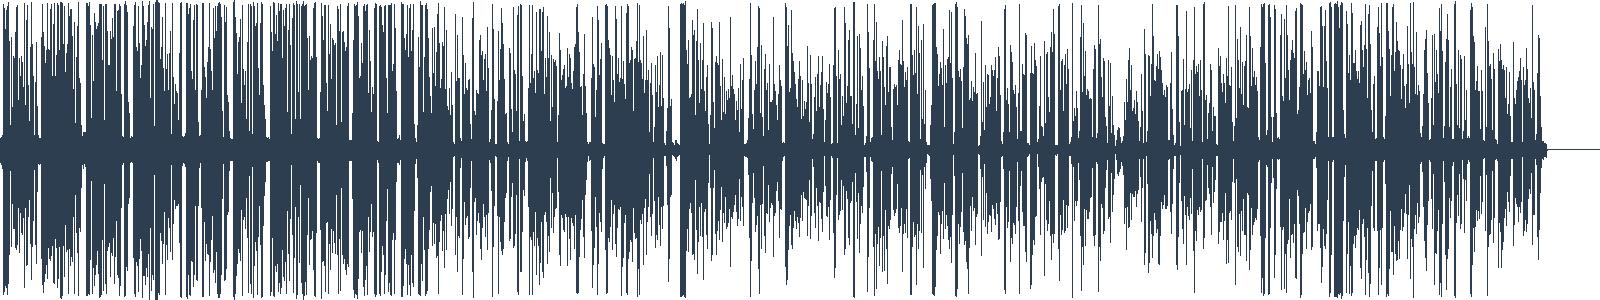 Pitný režim duše waveform